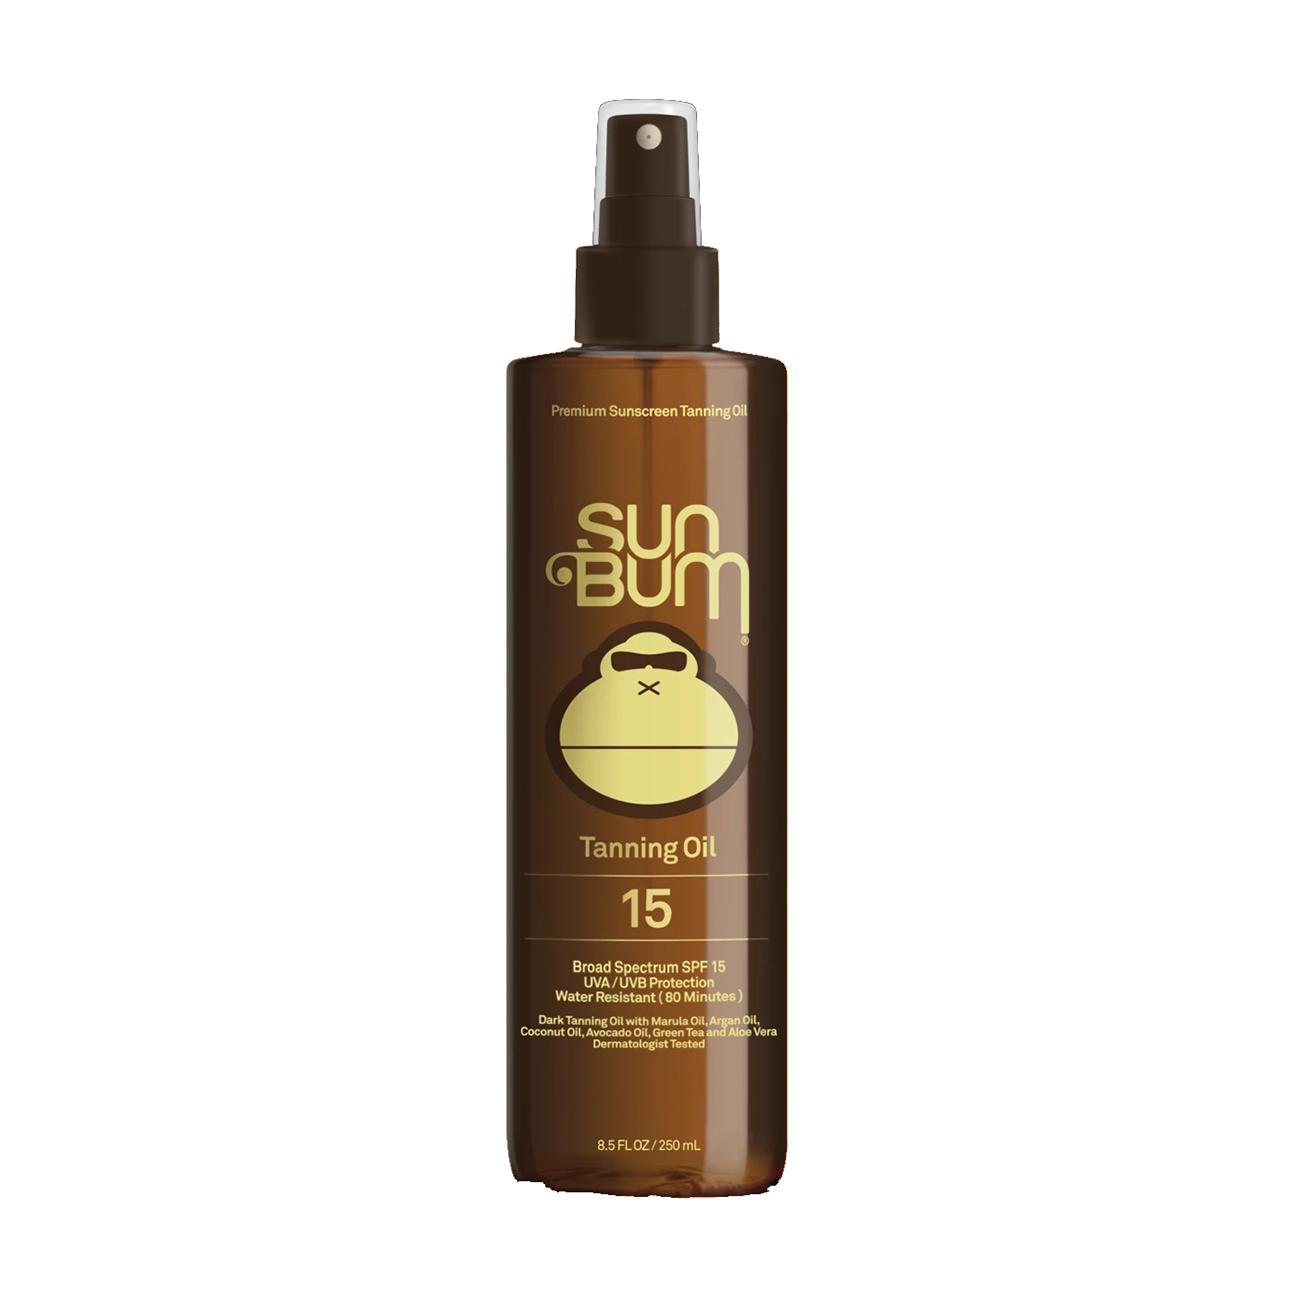 SPF 15 Sunscreen Tanning Oil, 8.5 oz-1